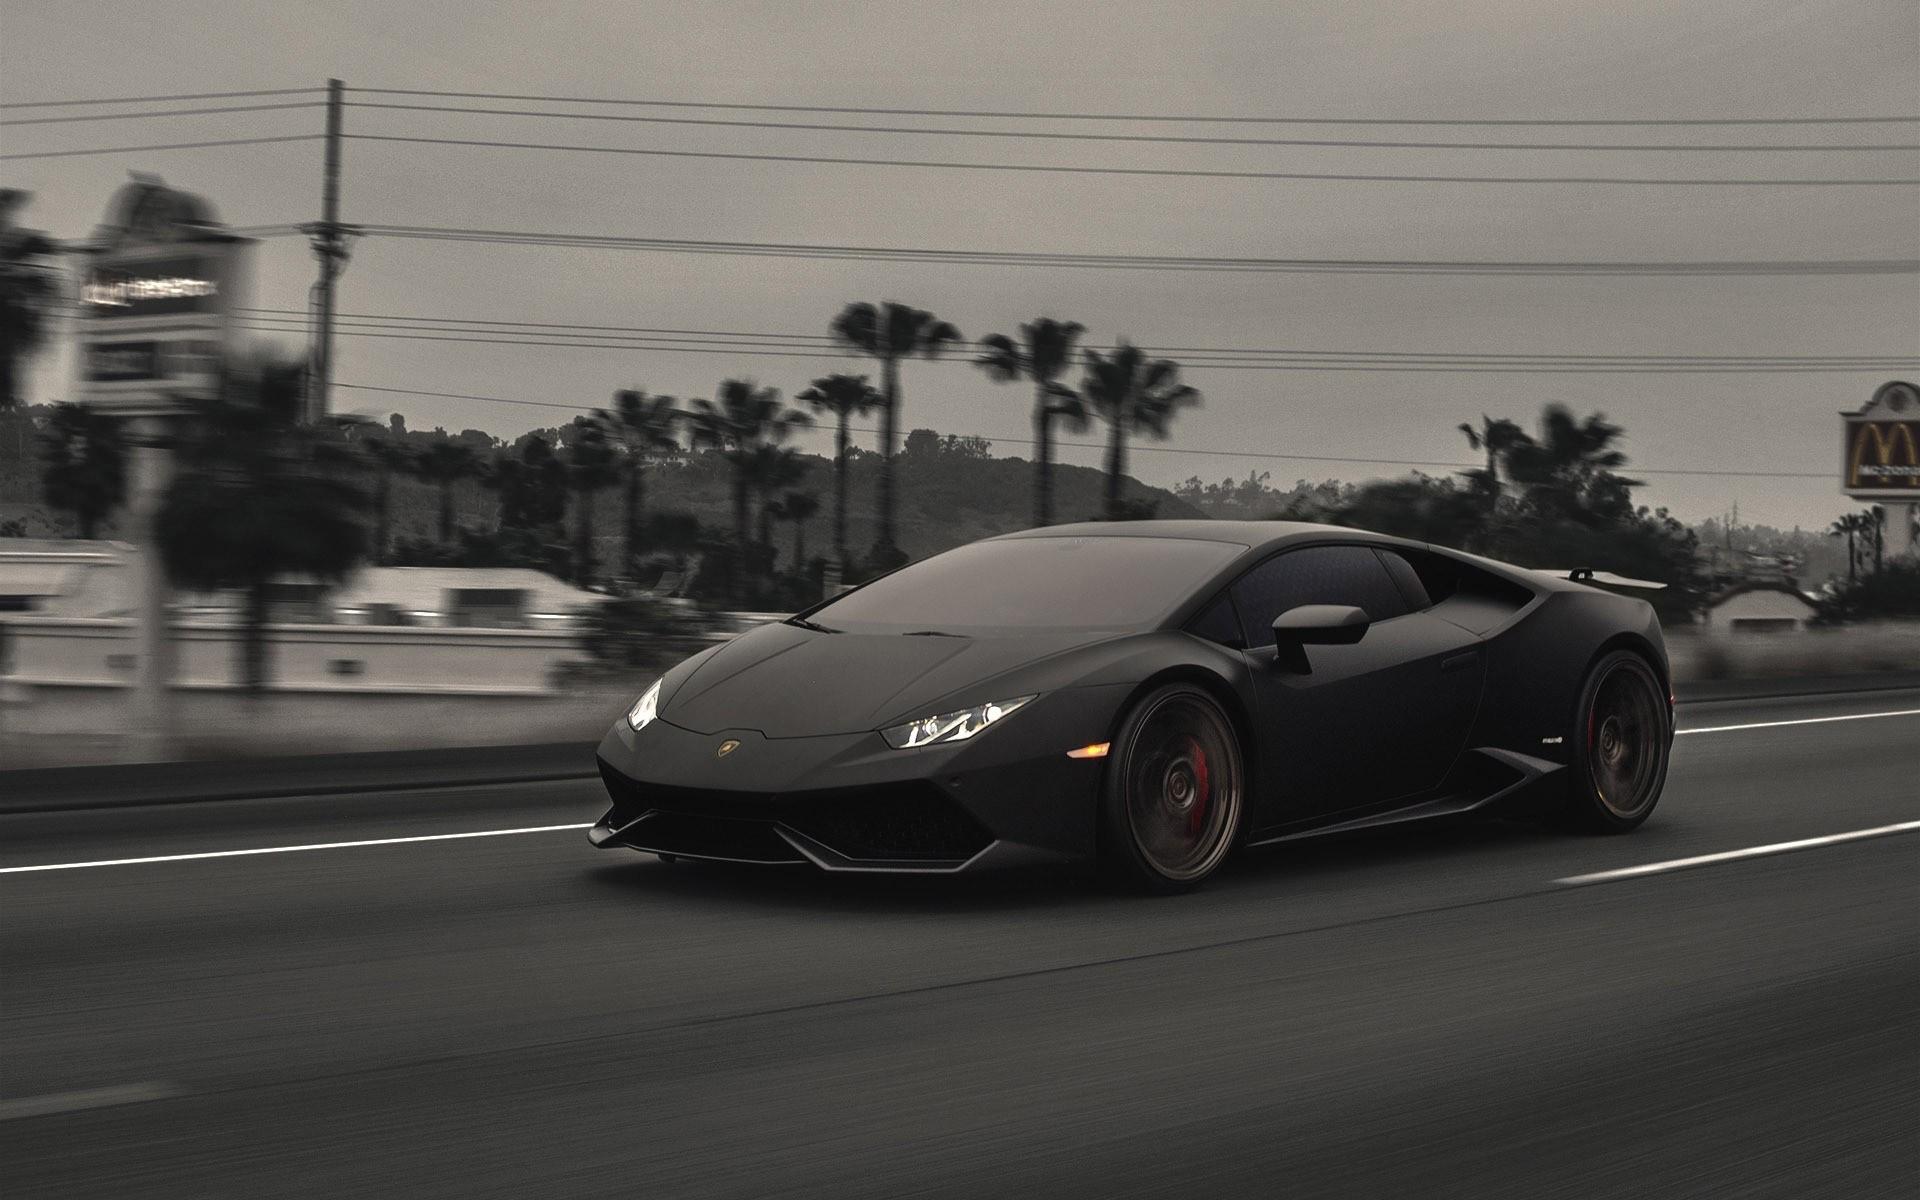 Res: 1920x1200, Black Huracan Lamborghini Car Wallpaper